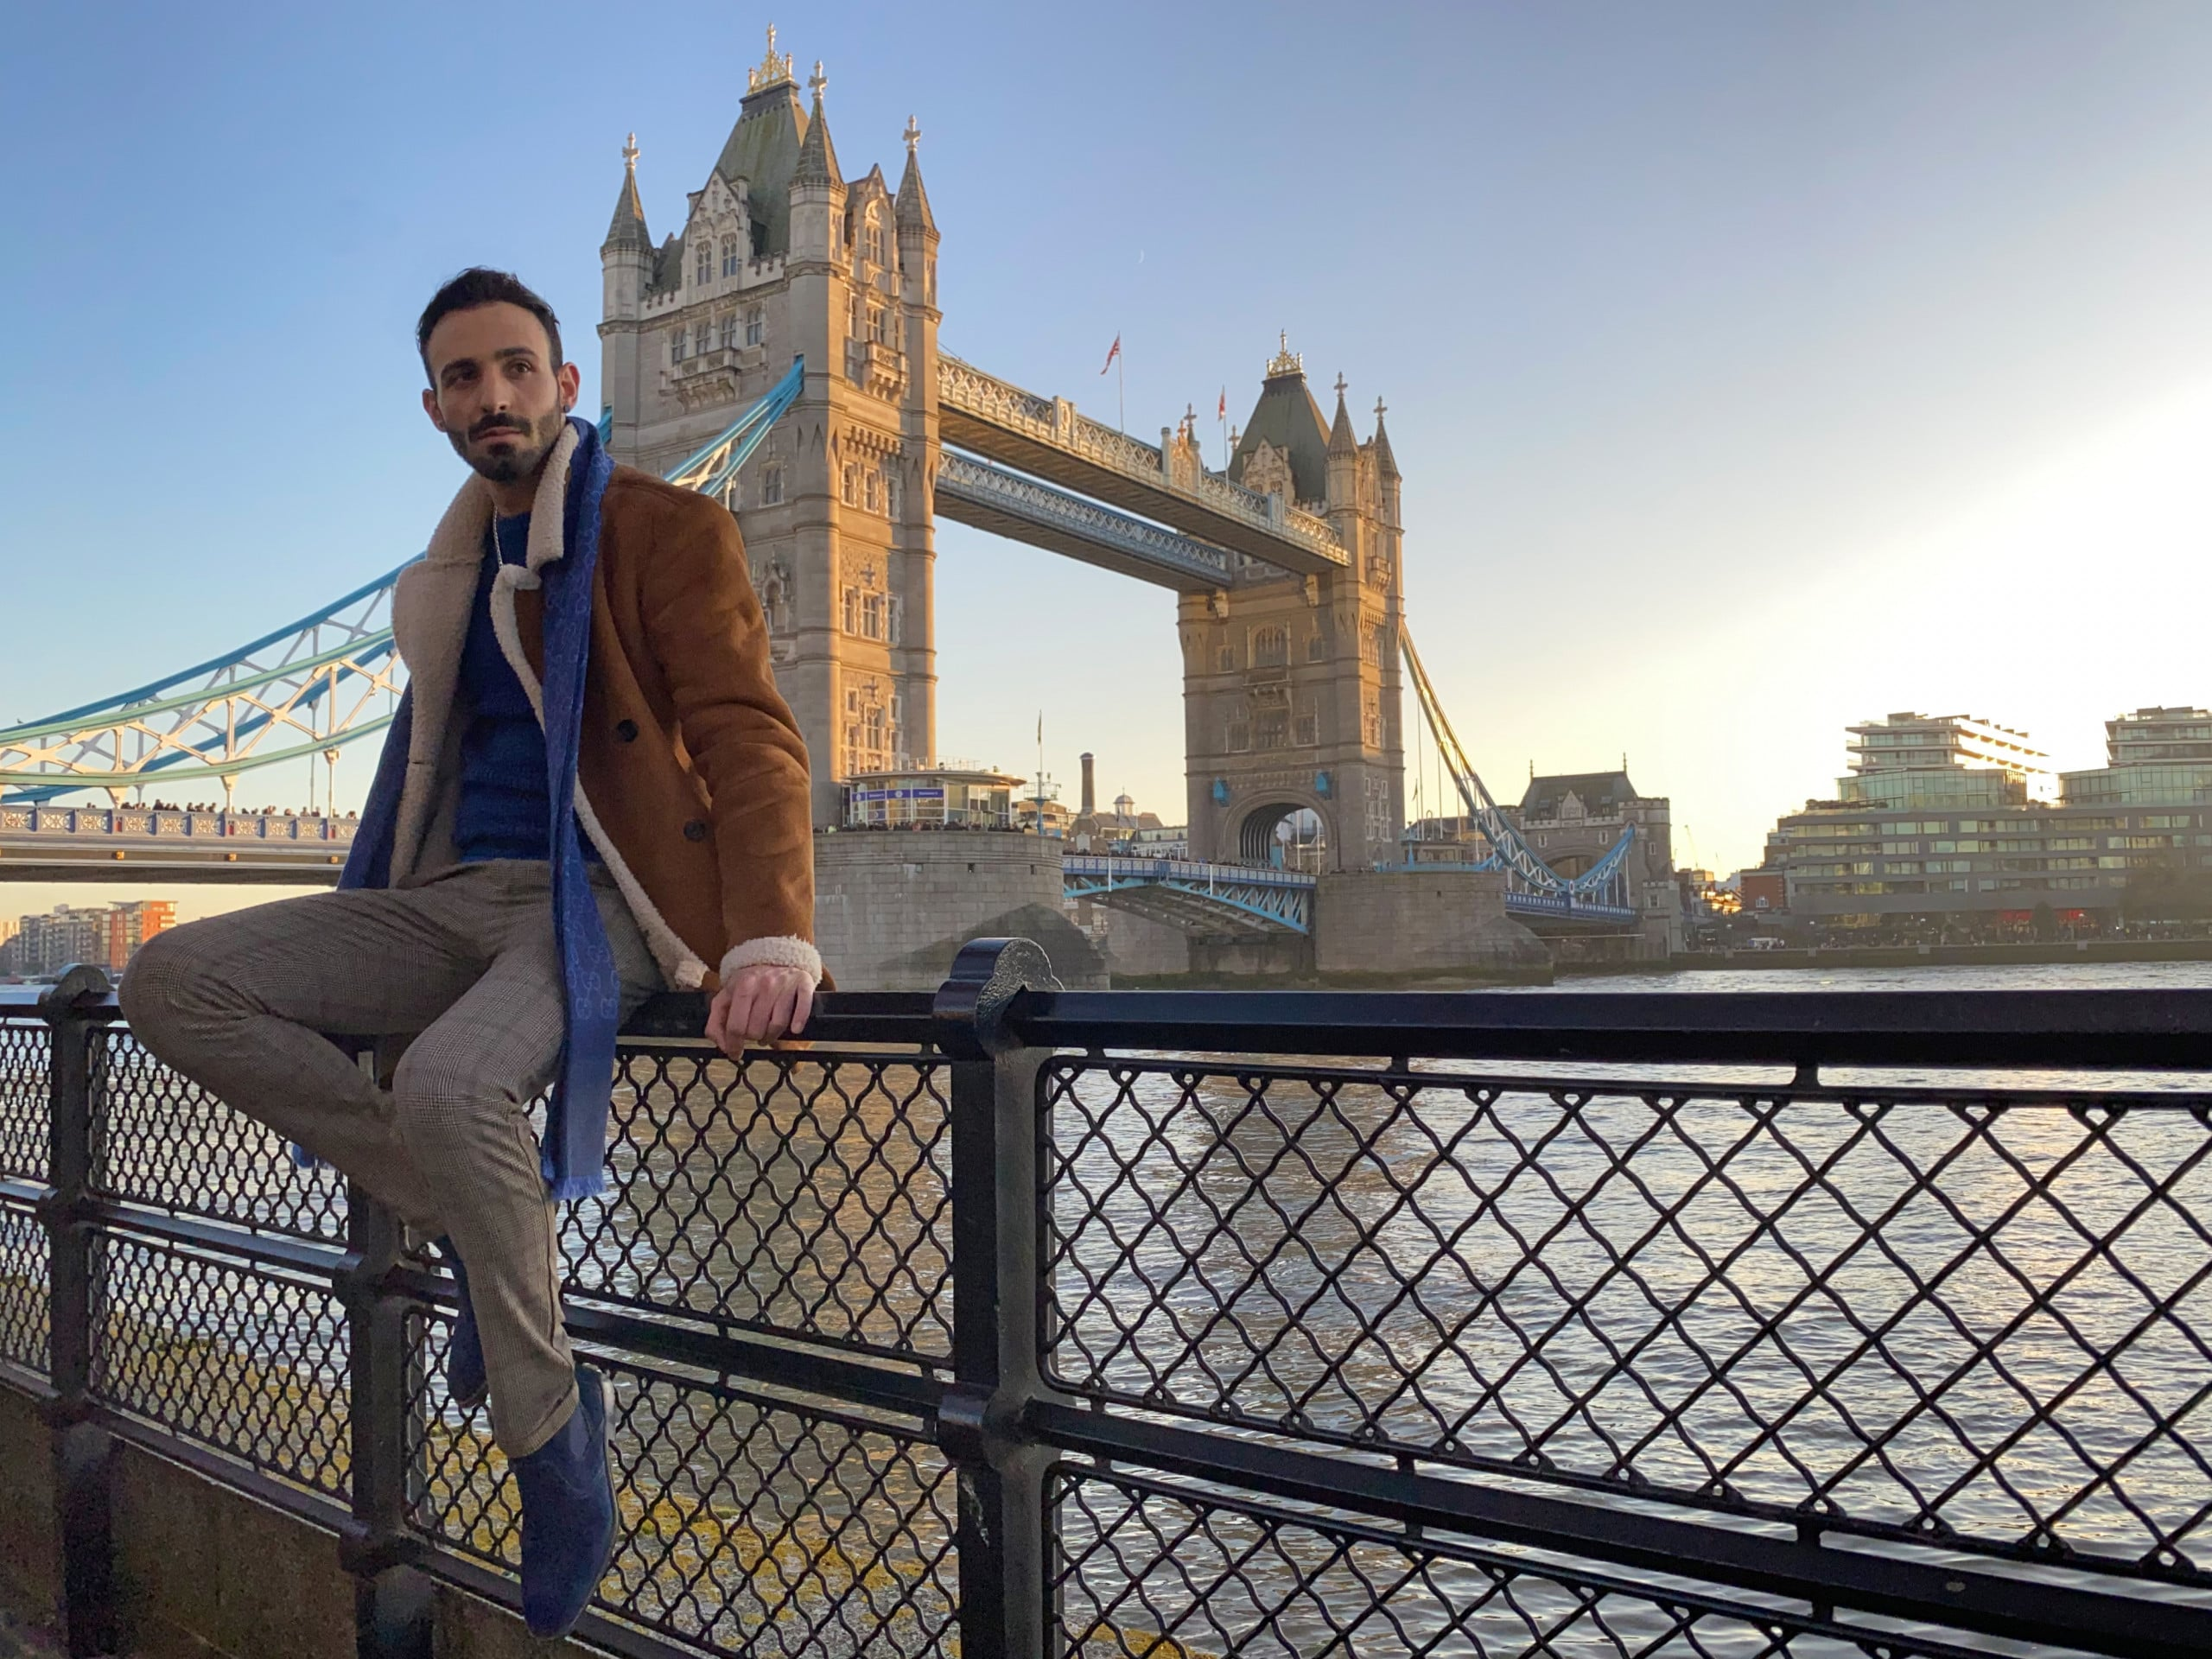 London Male Winter Fashion 4